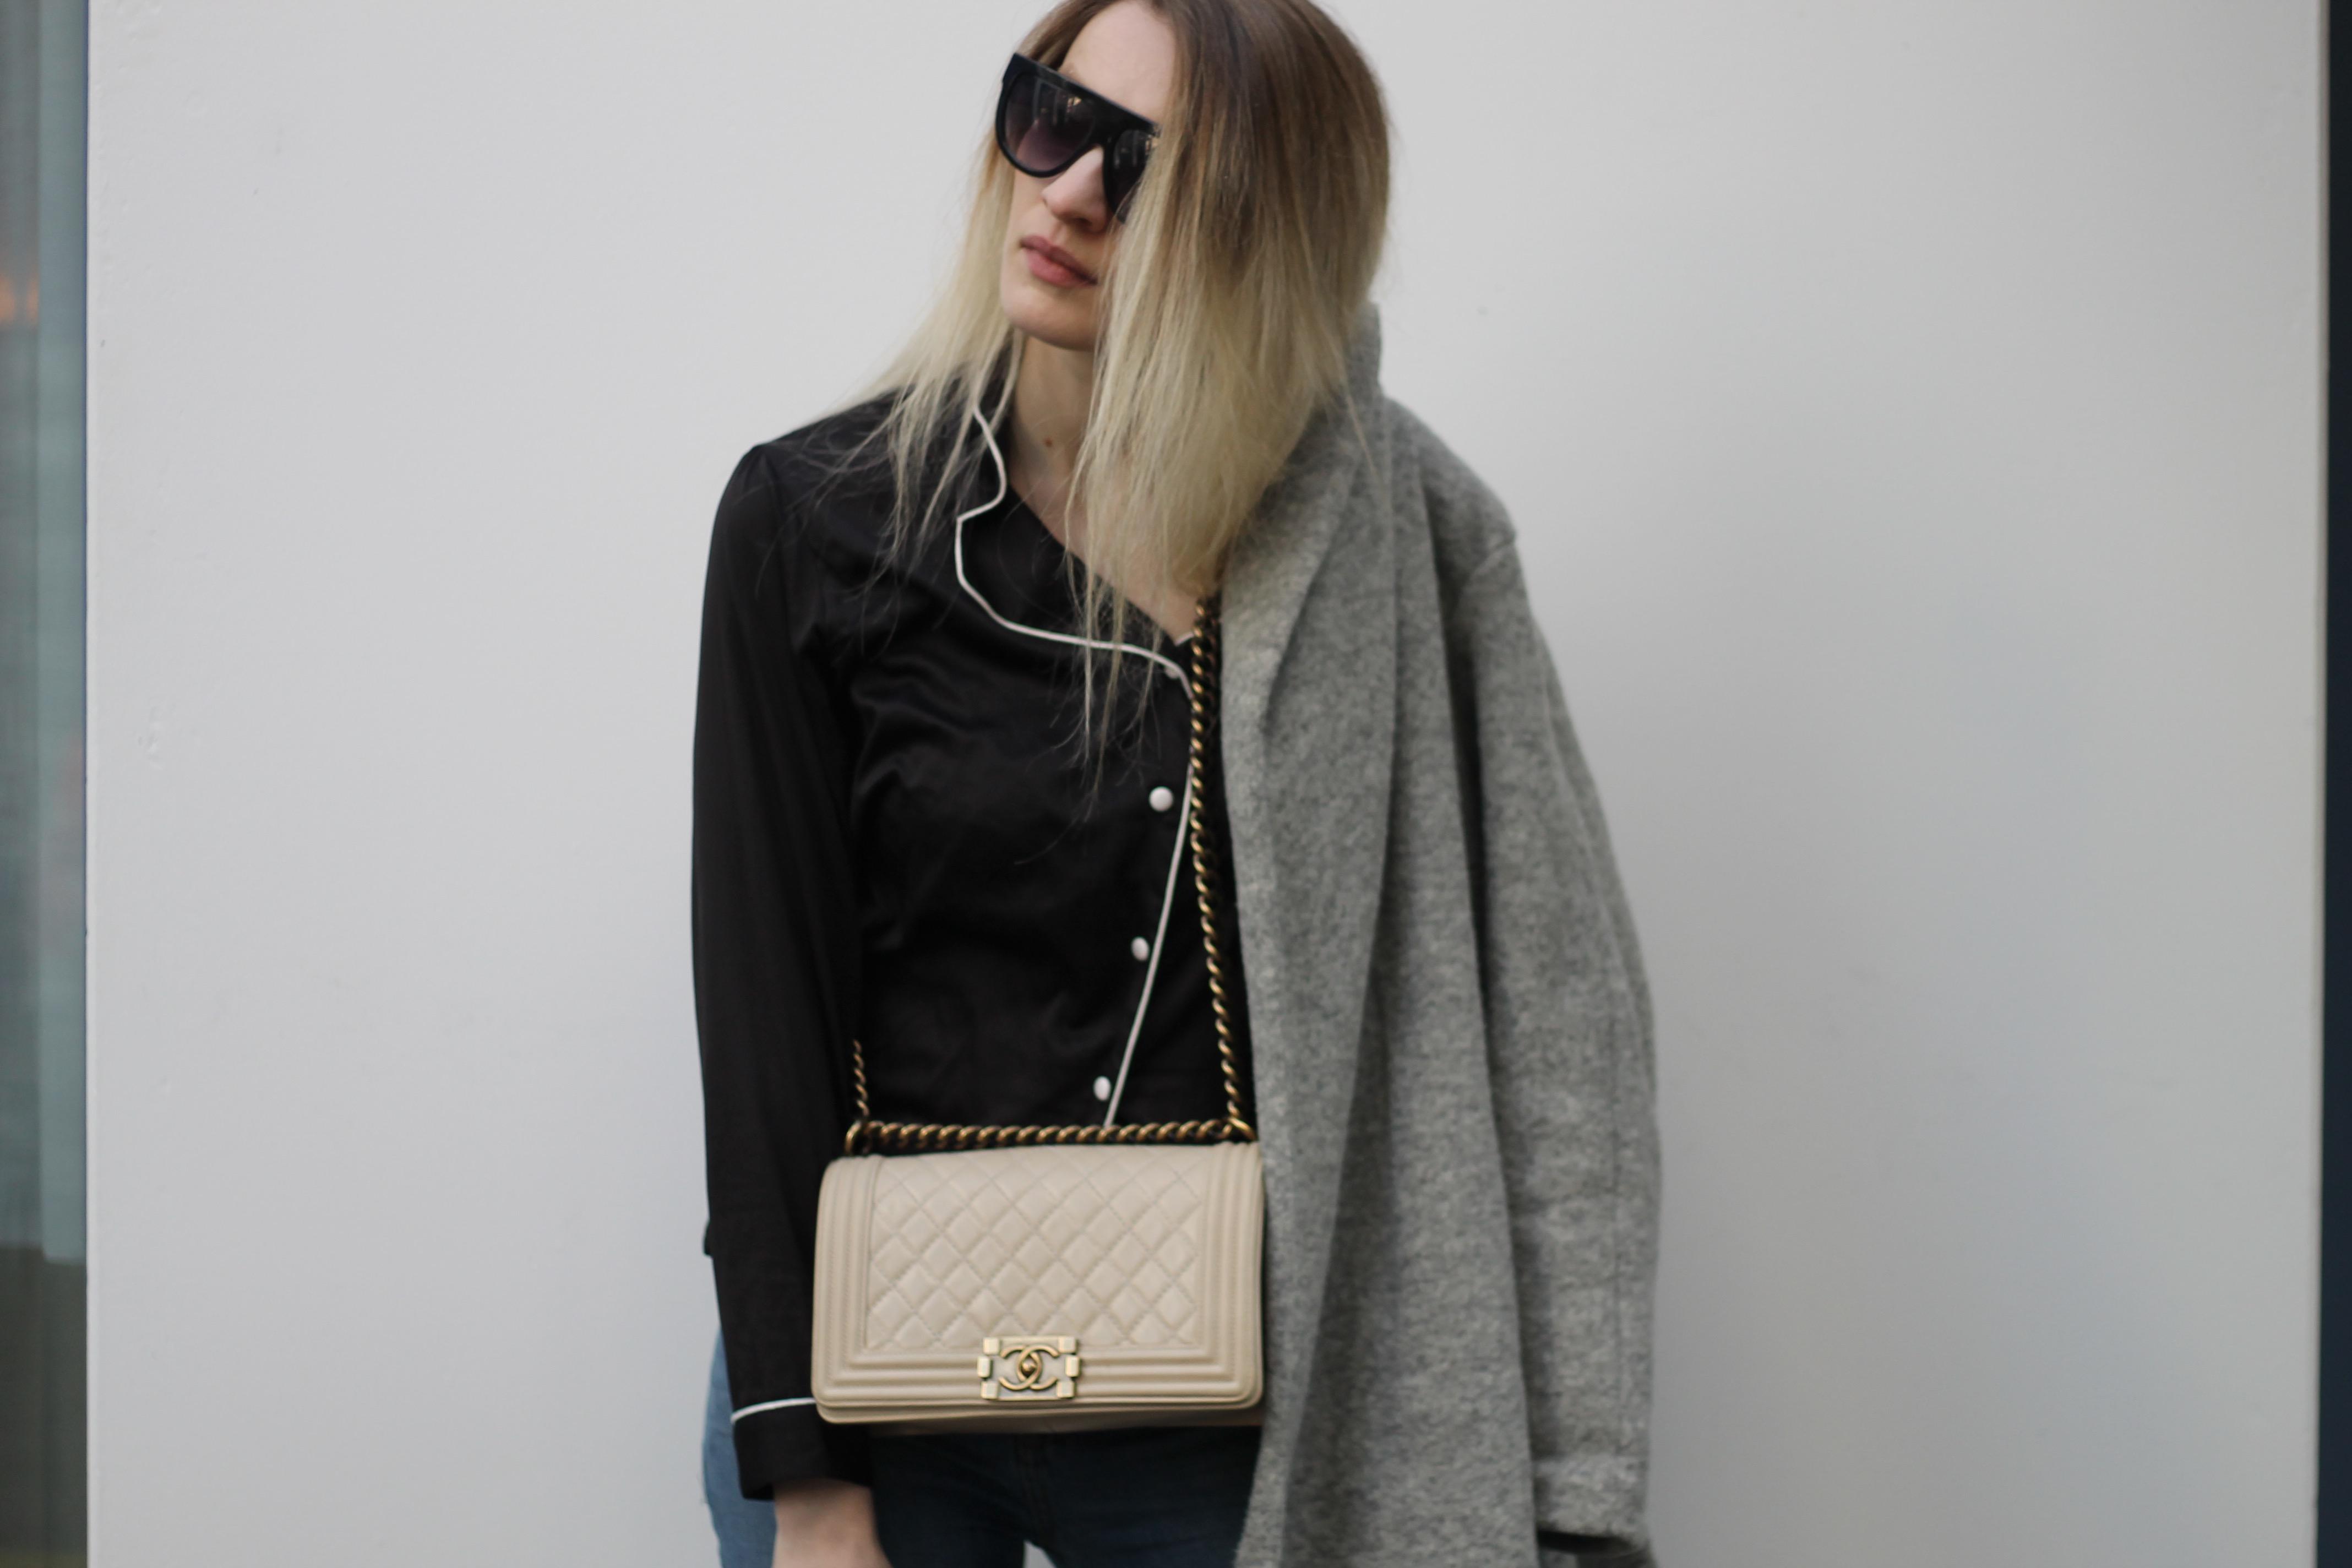 MON MODE   Fashion Blogger   Berlin Street Style   Fashion Trends   Berlin Fashion  Travel Blogger  PJ Bed Sheets   Chanel Boy